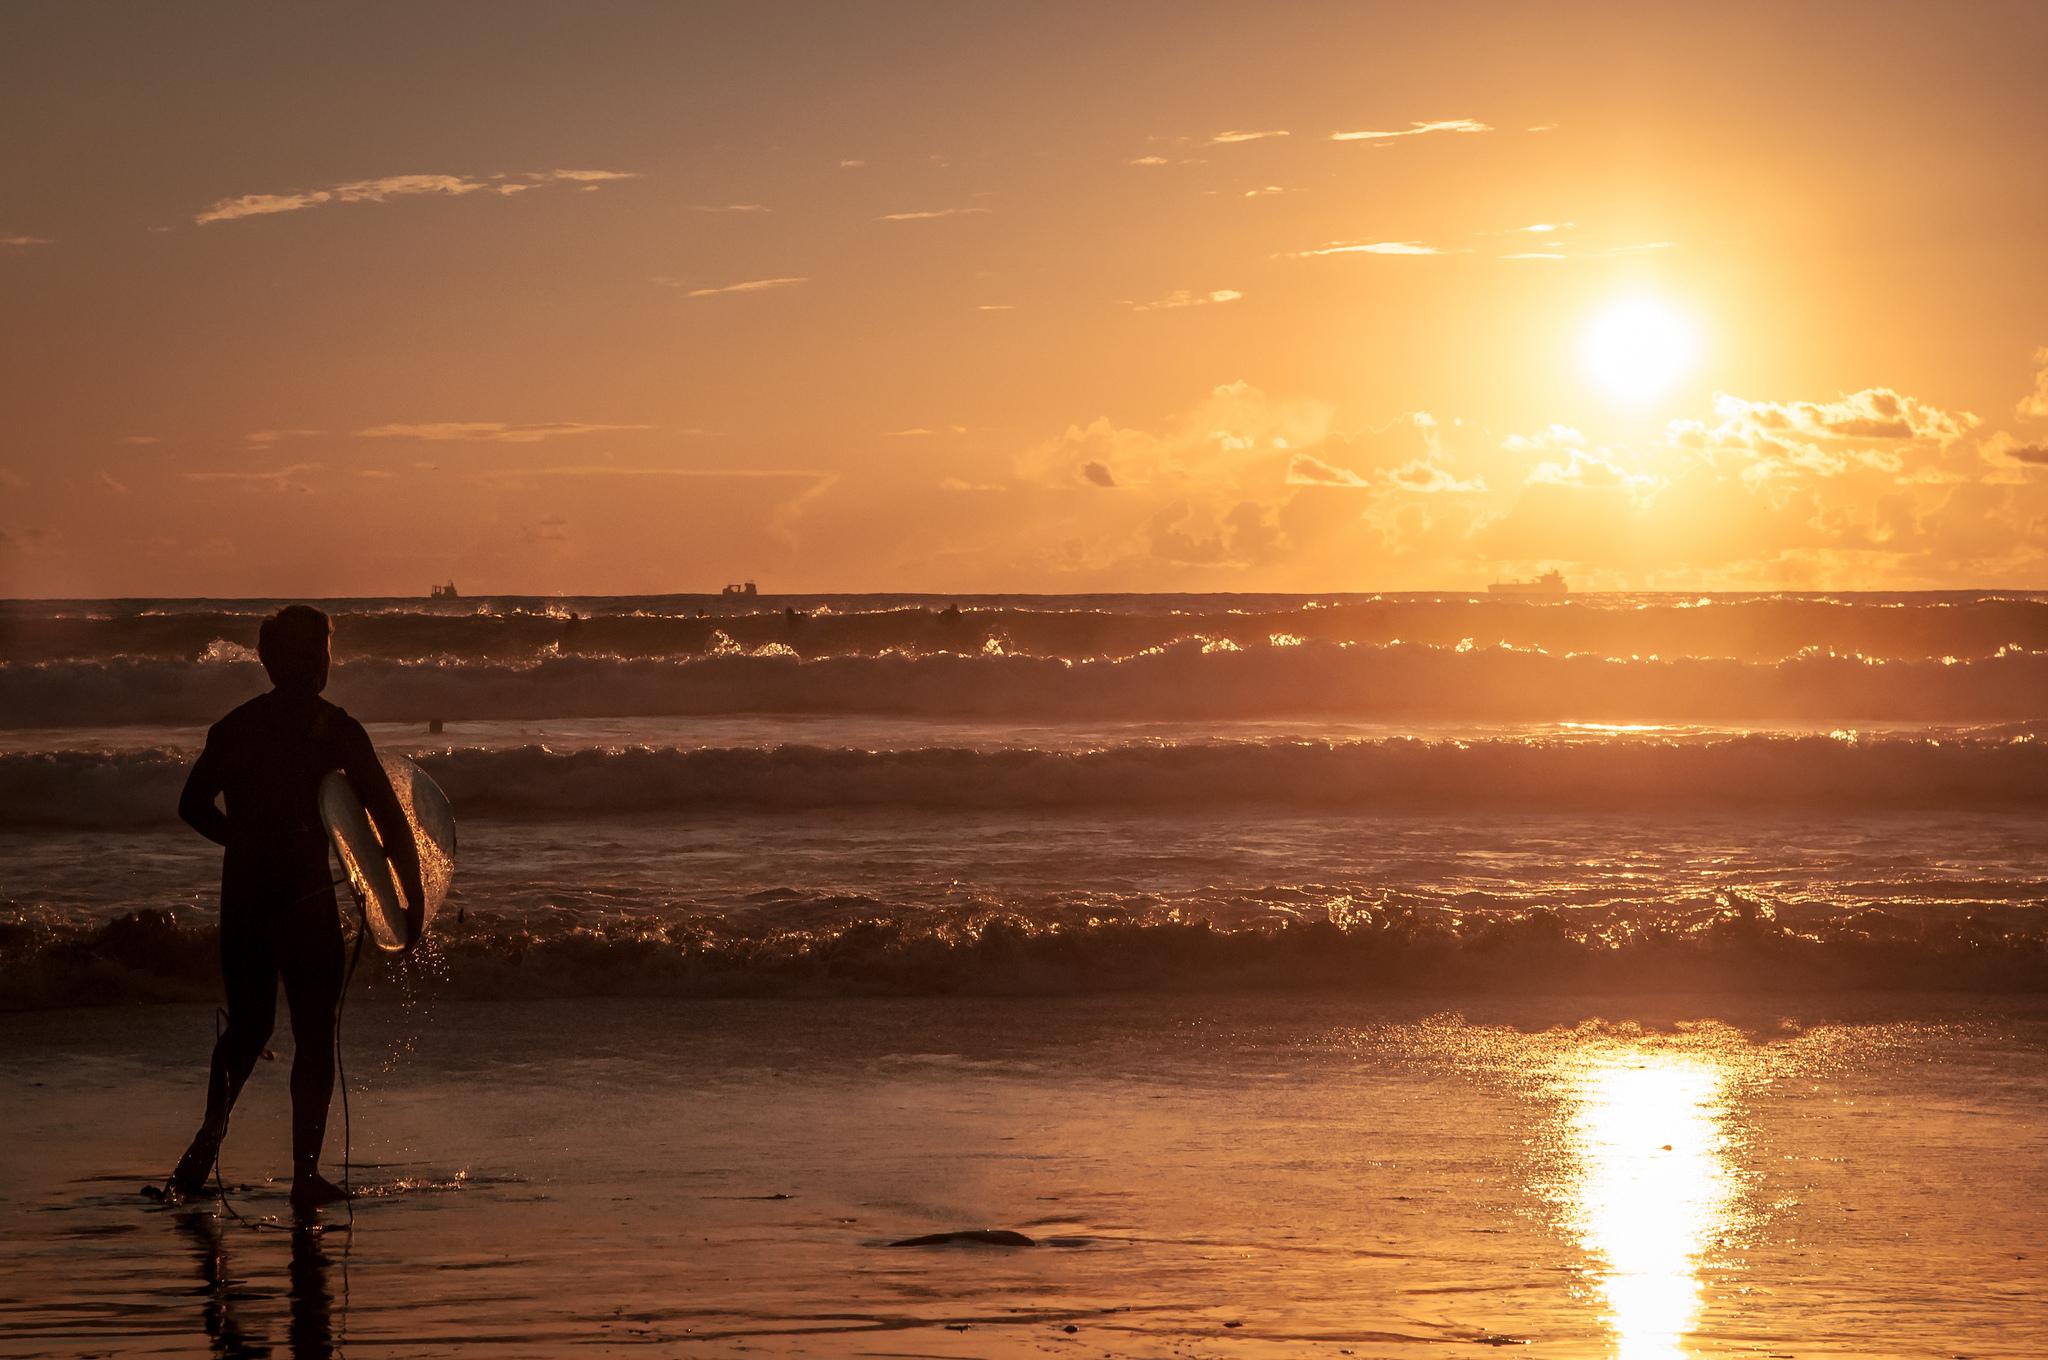 Surfing at Praia do Castelo © Christian PARREIRA